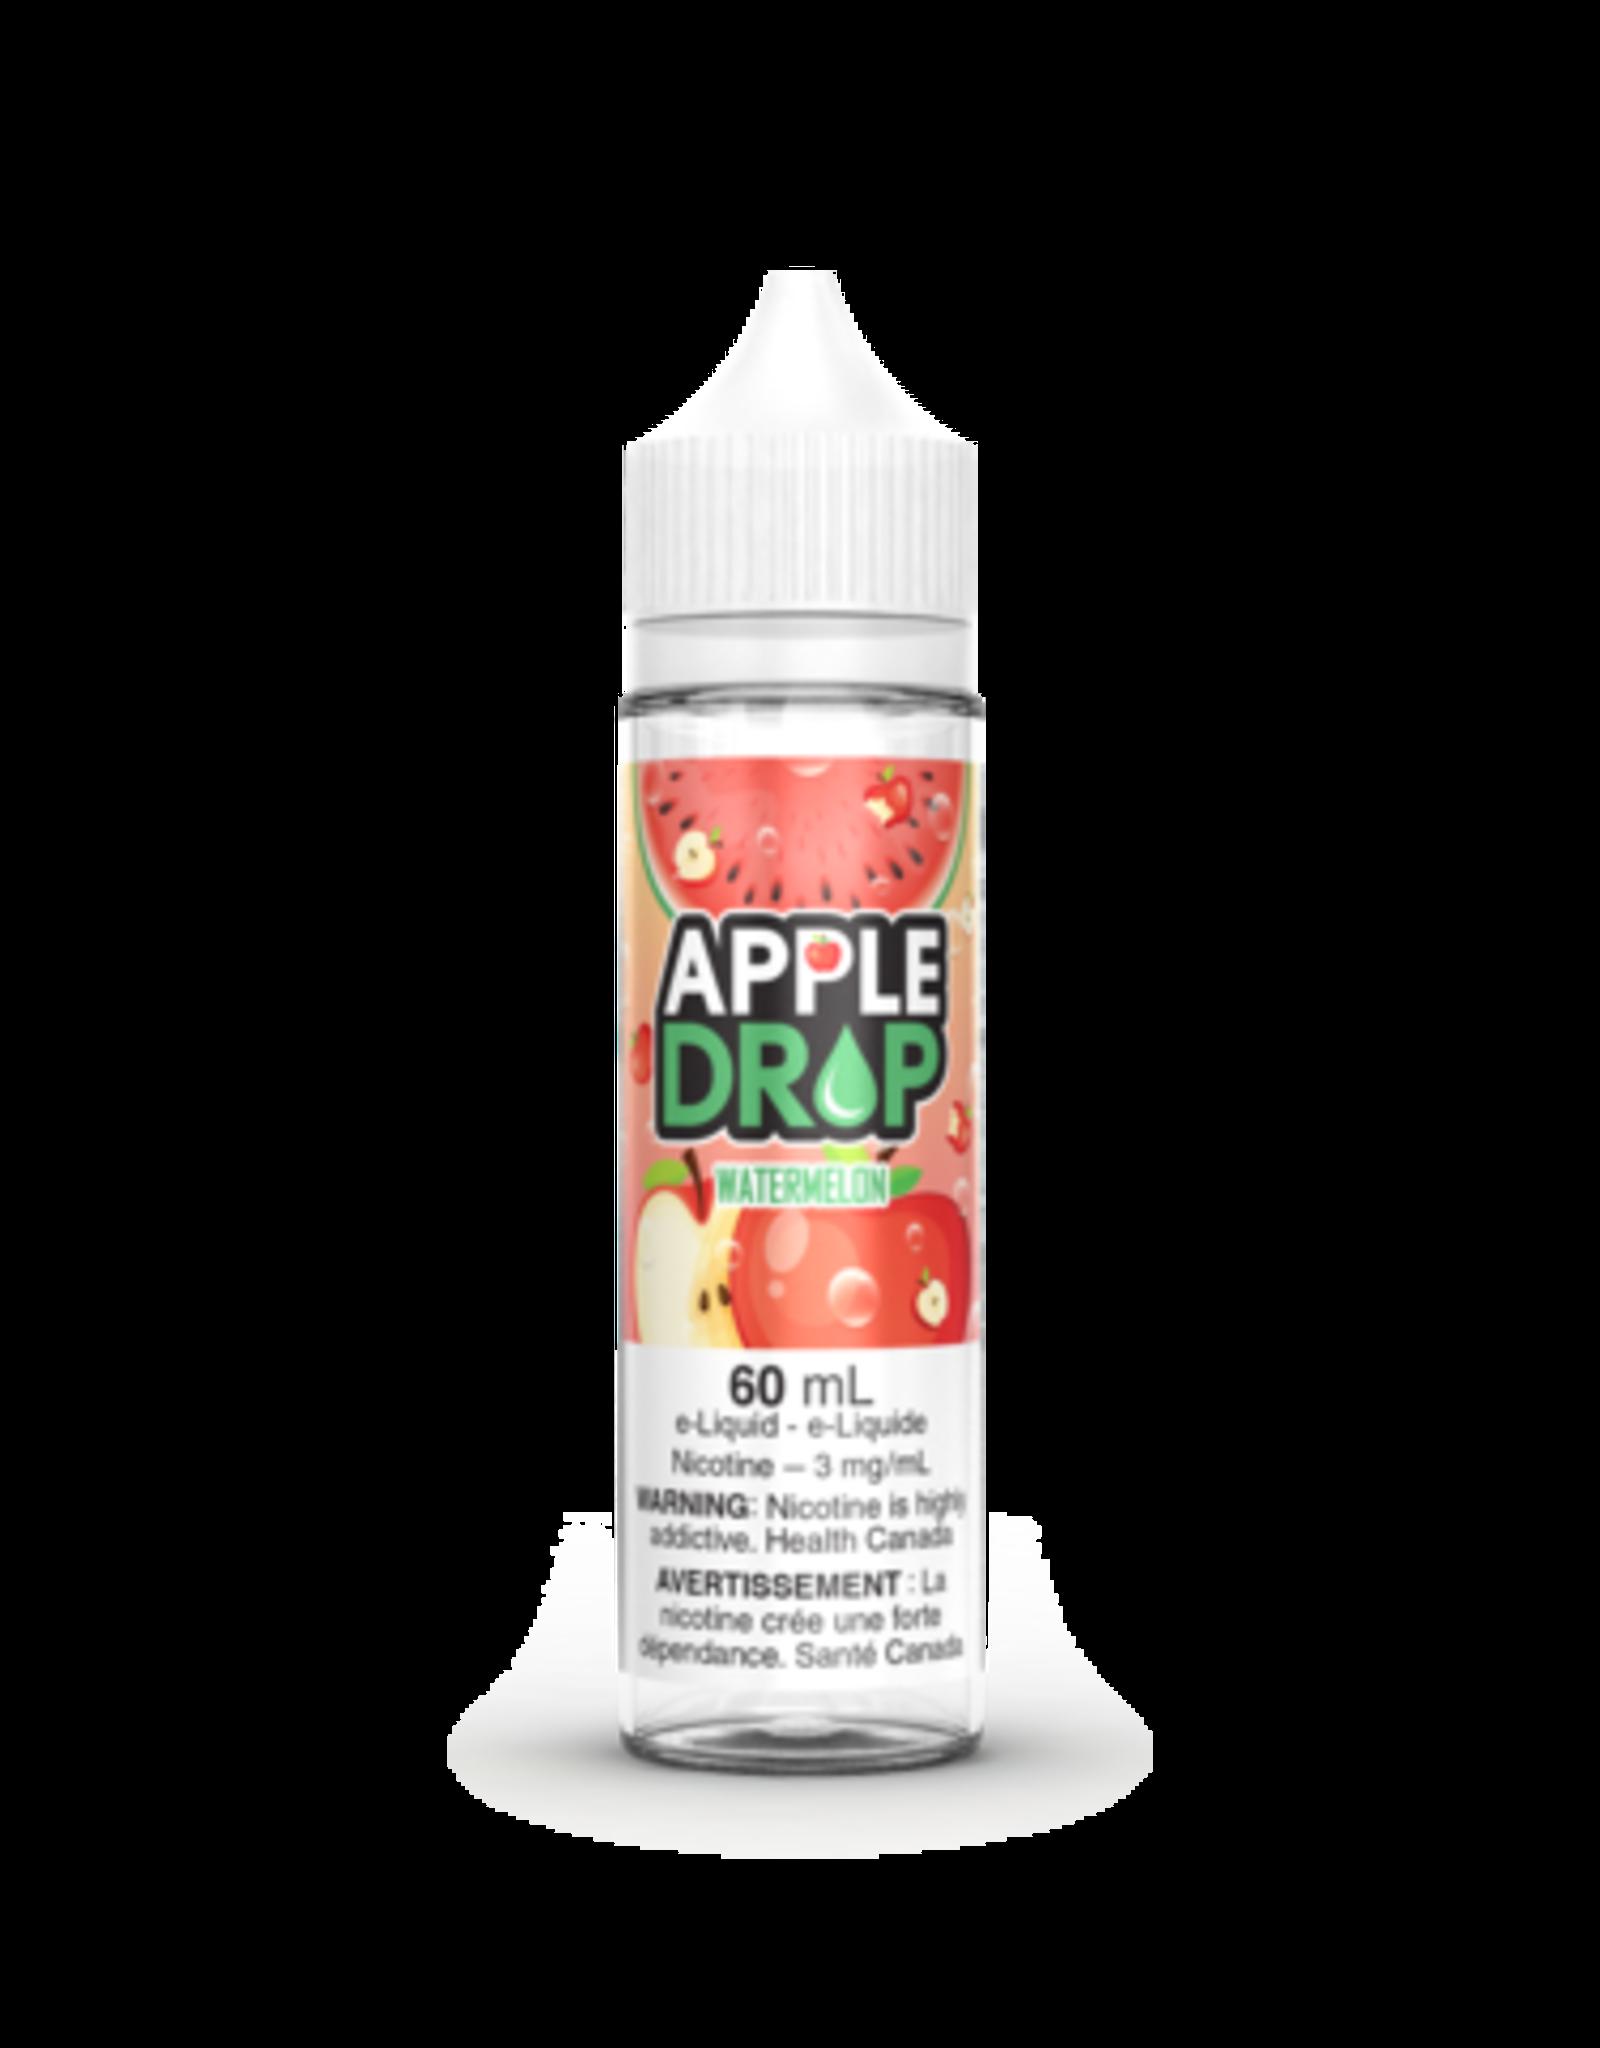 Apple Drop